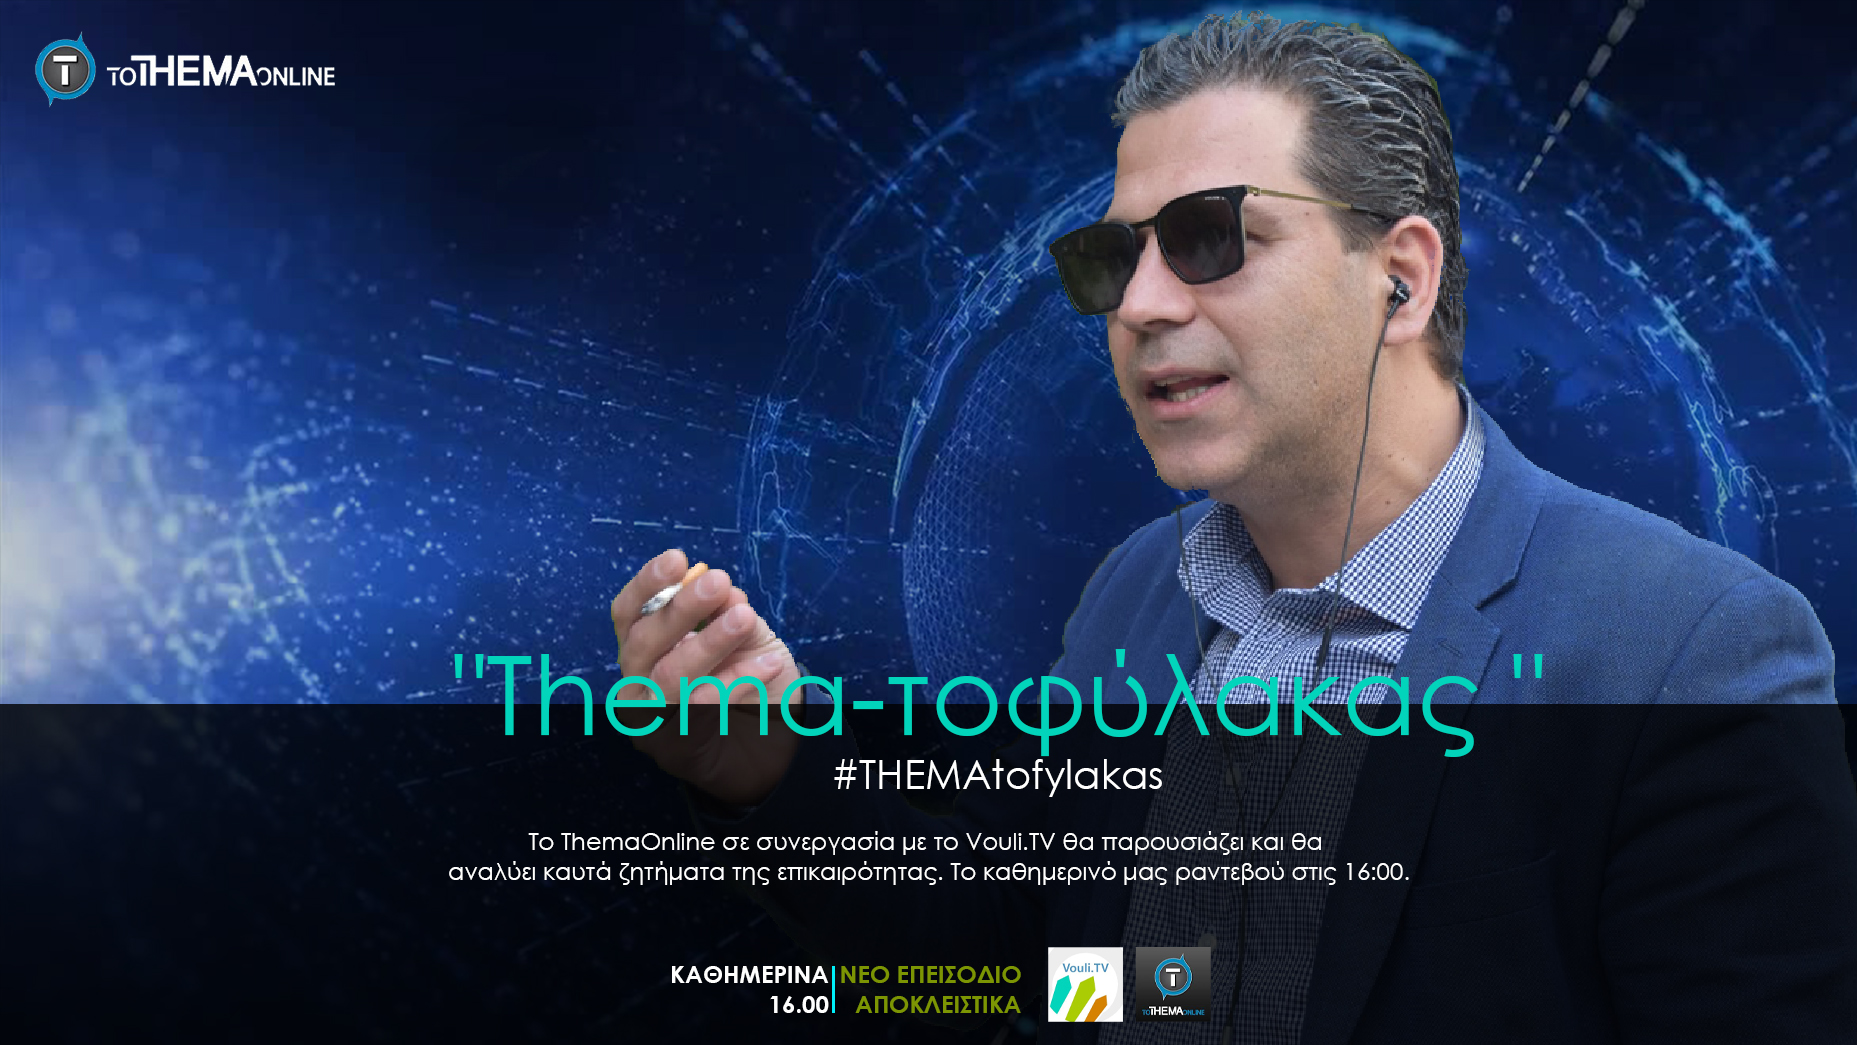 Thema-τοφύλακας | LIVE Δευτέρα 1/6/2020 @ 4μμ